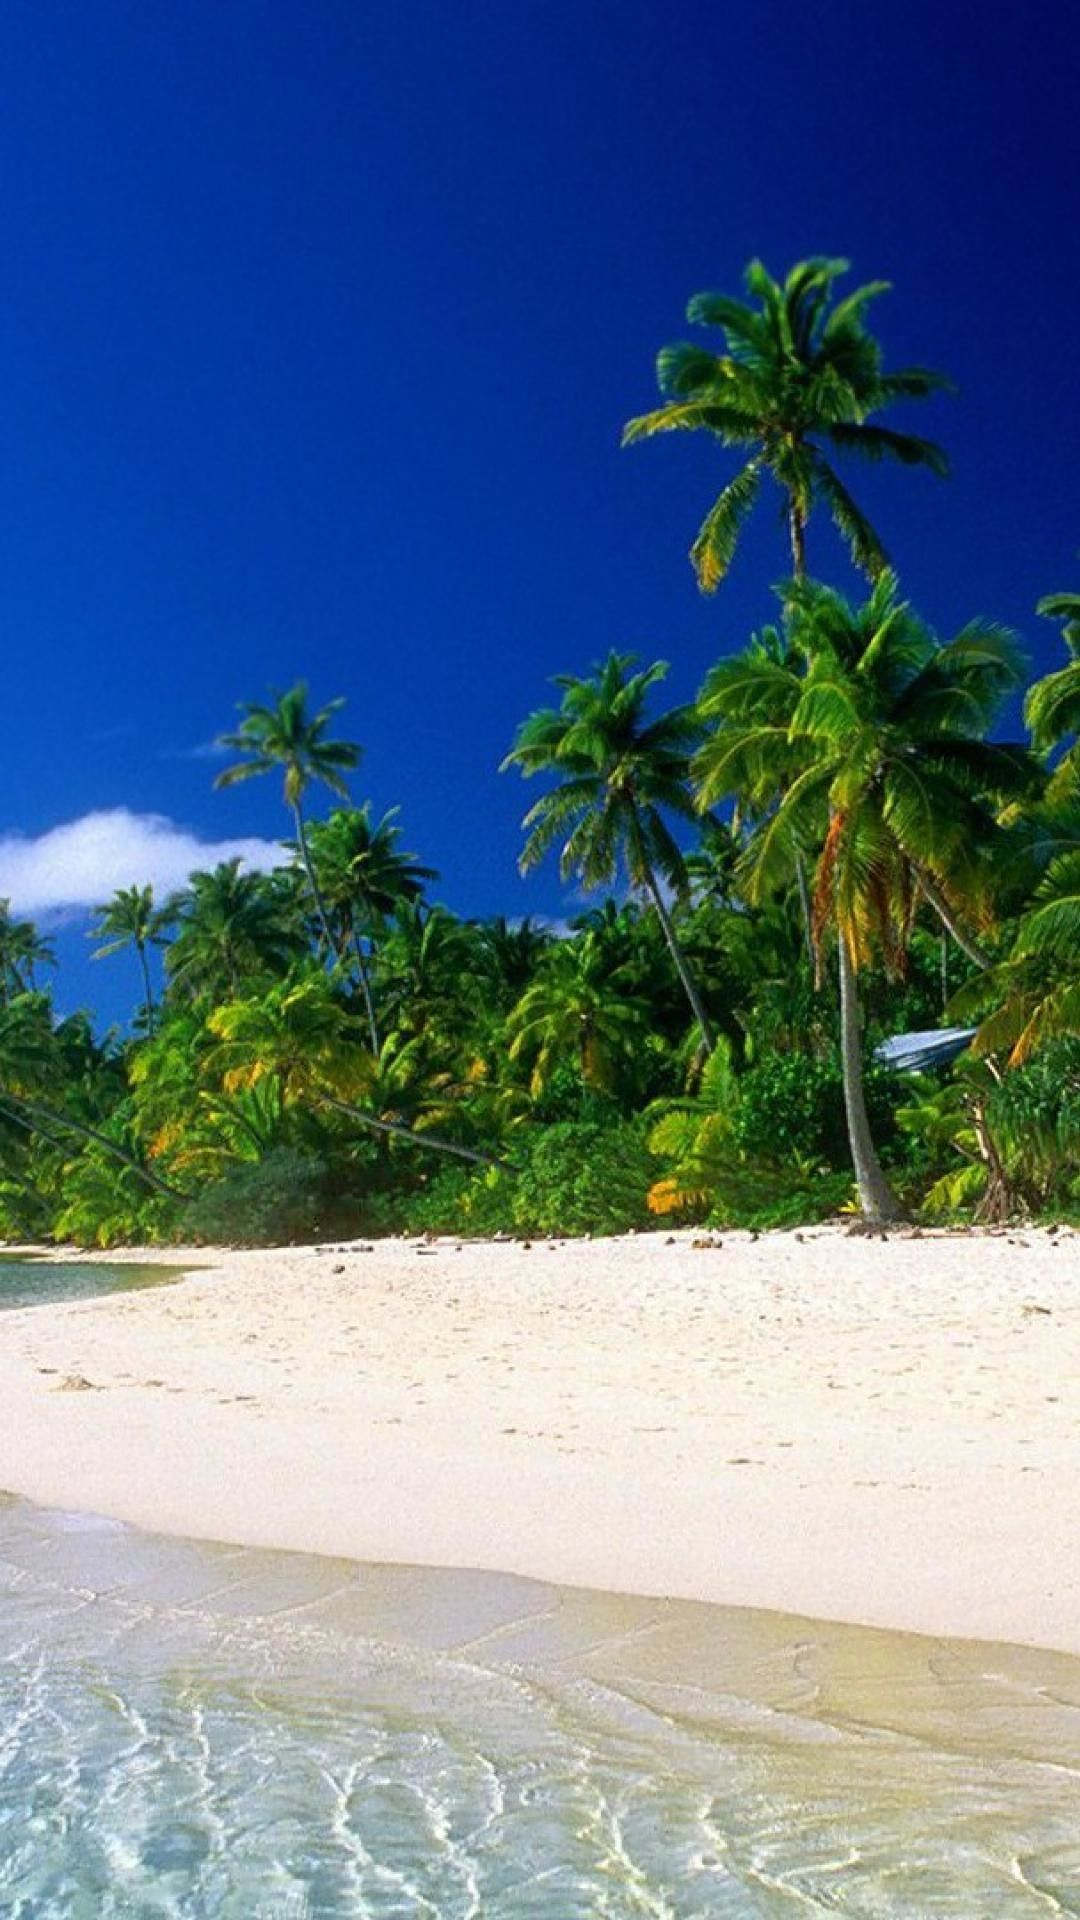 1080x1920 Beach Live Wallpaper Icon Nature Beach Iphone 6 Plus Hd